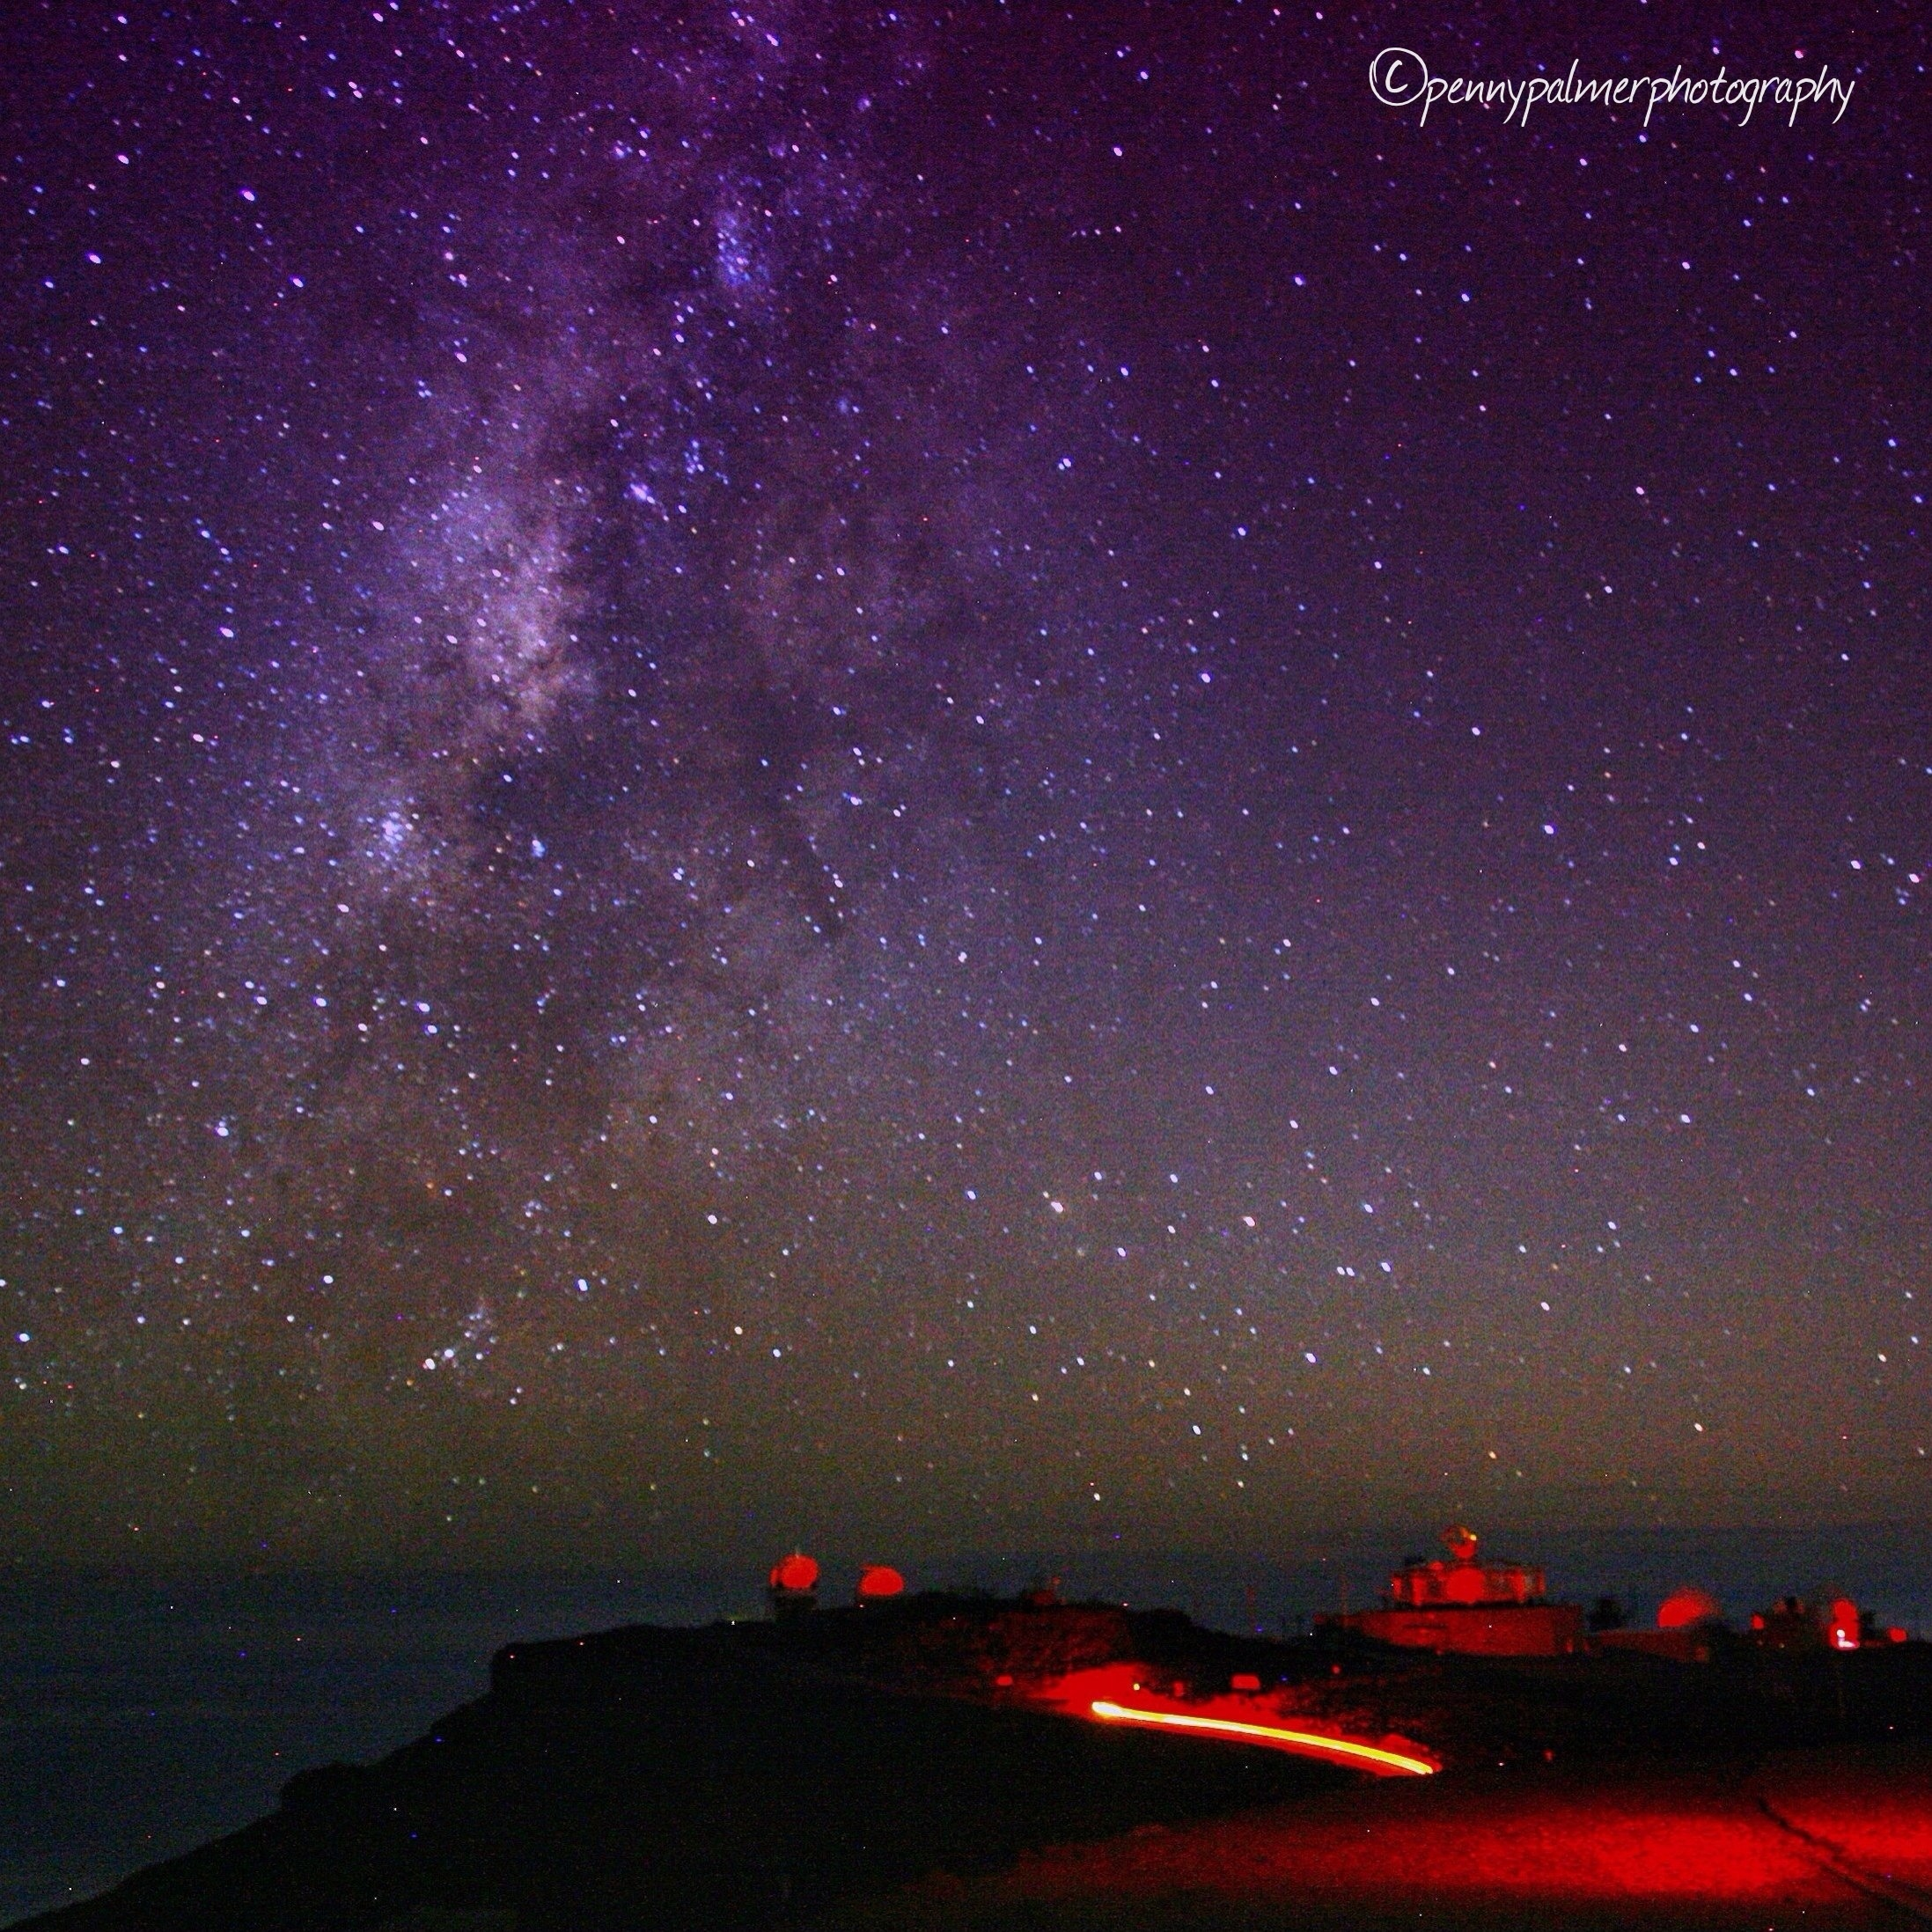 http://pennypalmerphotography.com/wp-content/uploads/2013/04/Haleakala-Milky-Way.jpg